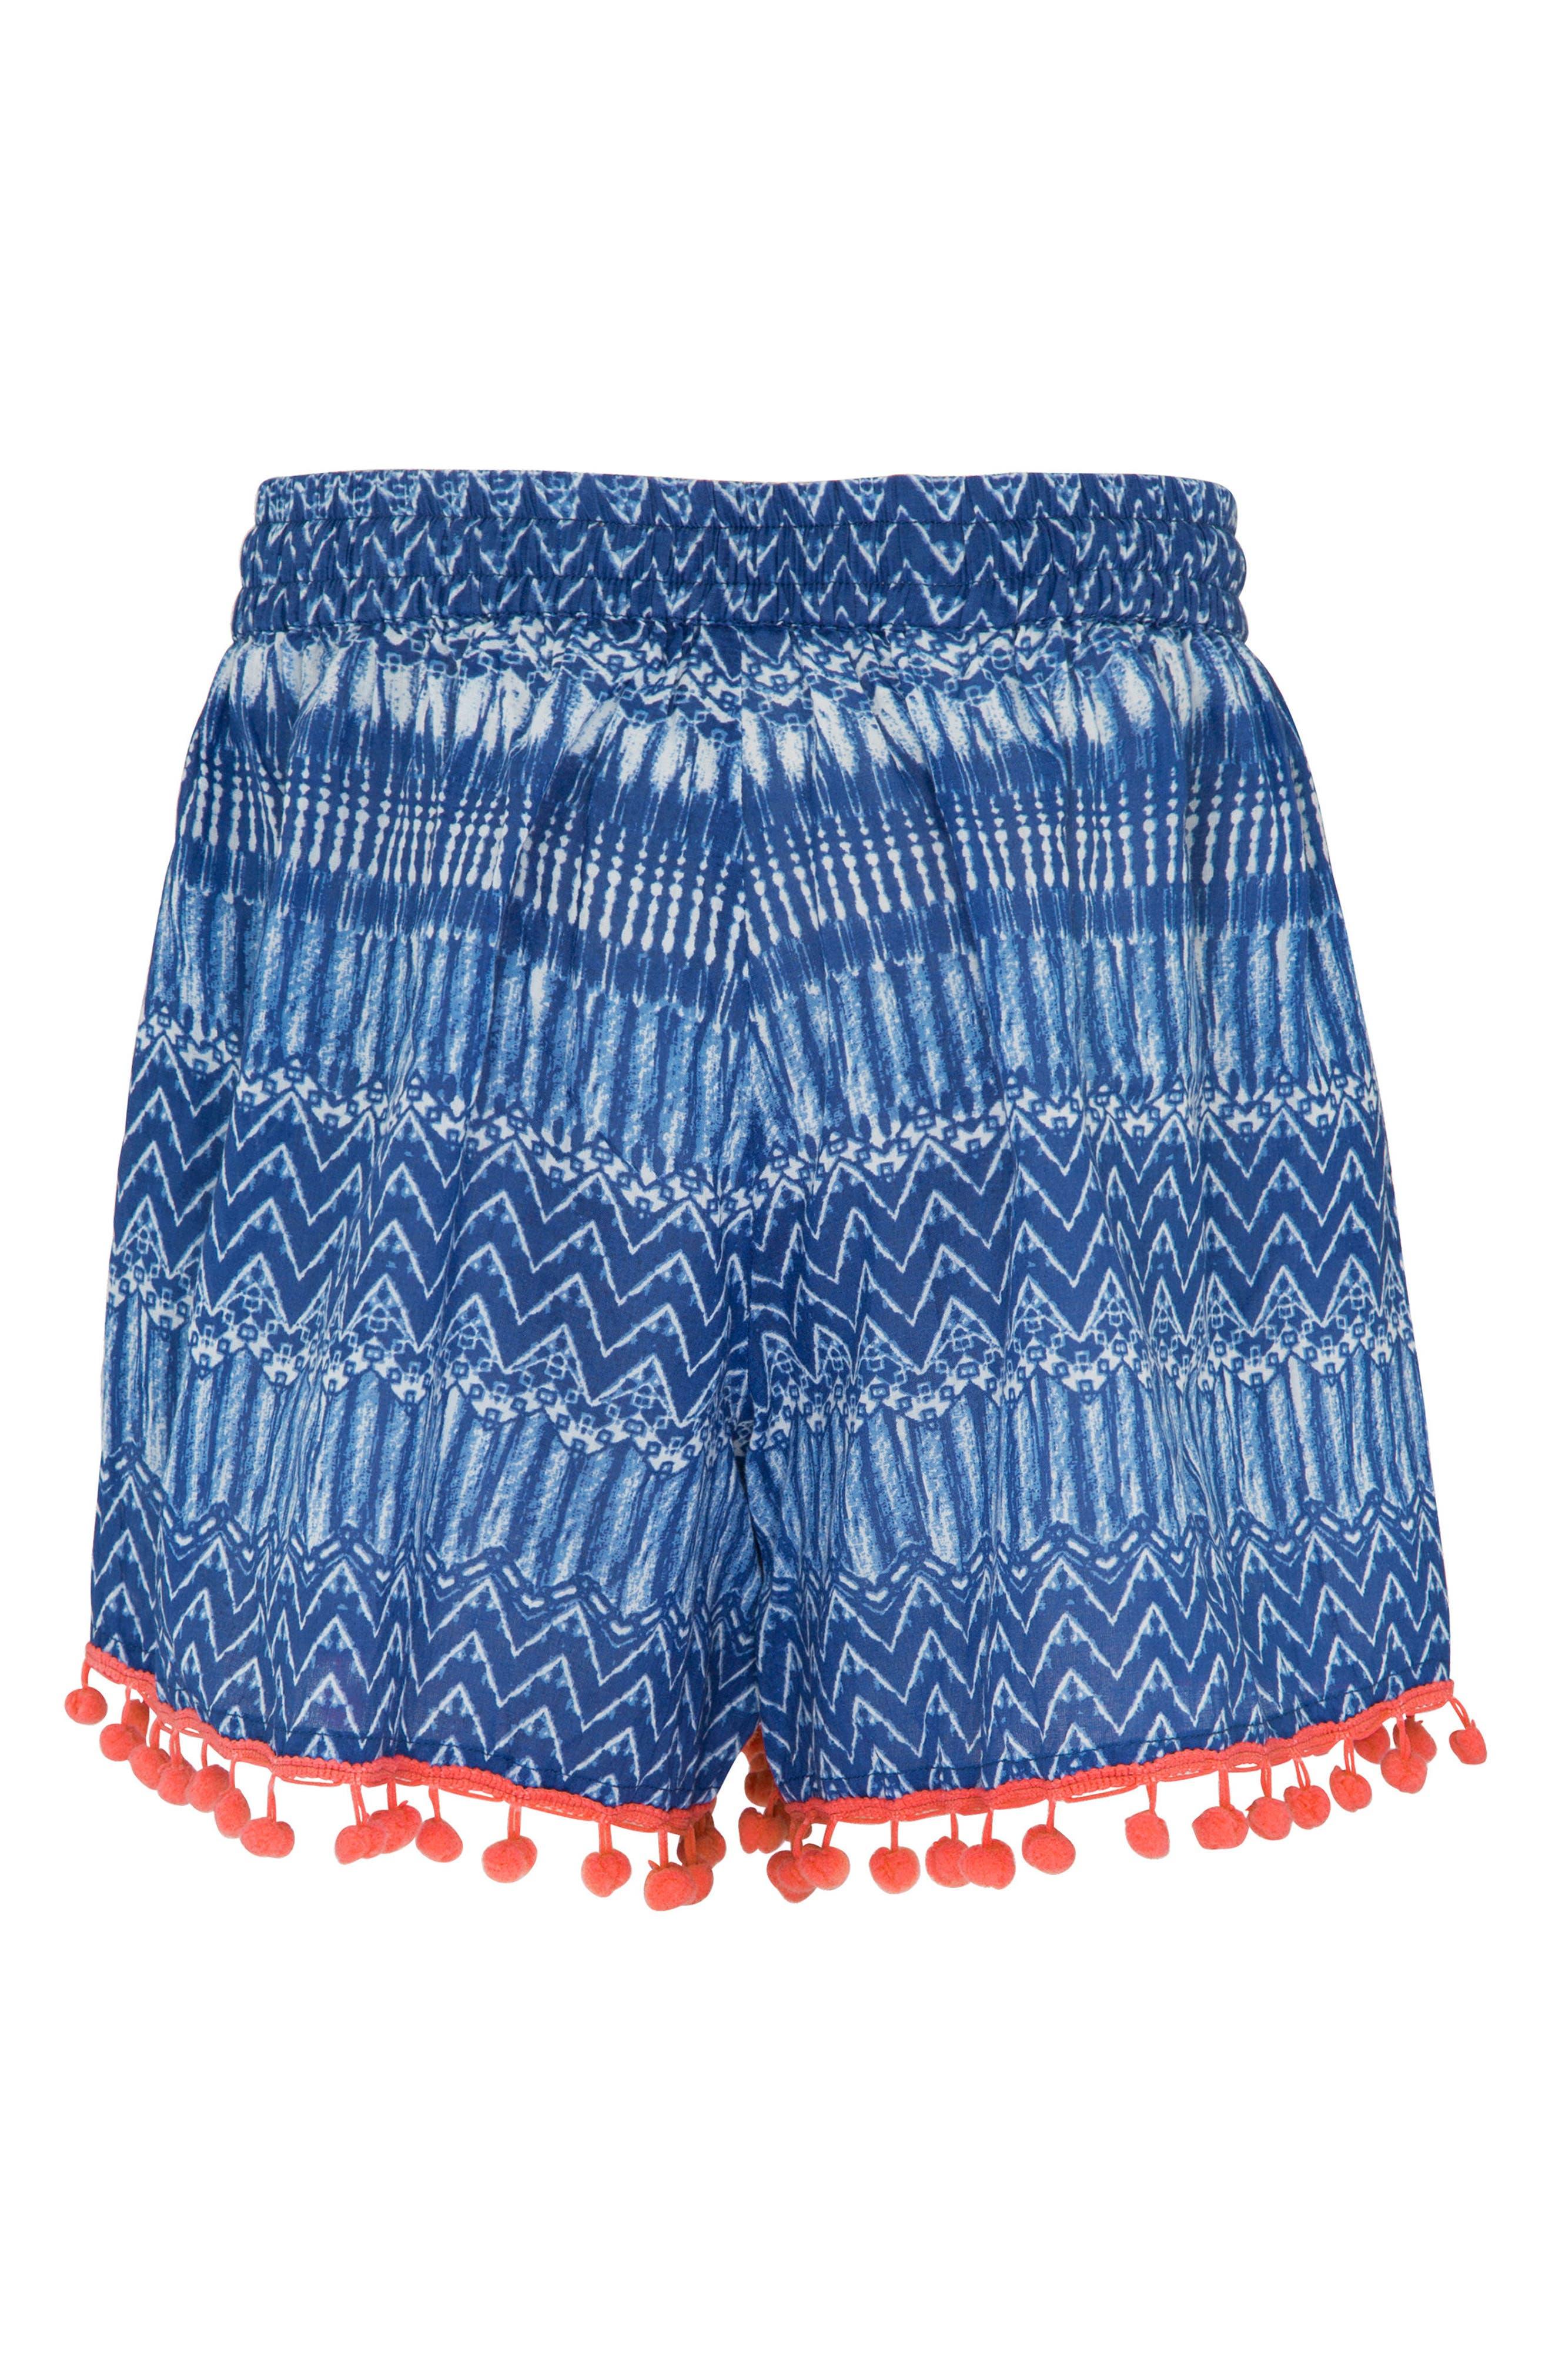 Alternate Image 3  - Platypus Australia Print Cover-Up Shorts (Big Girls)